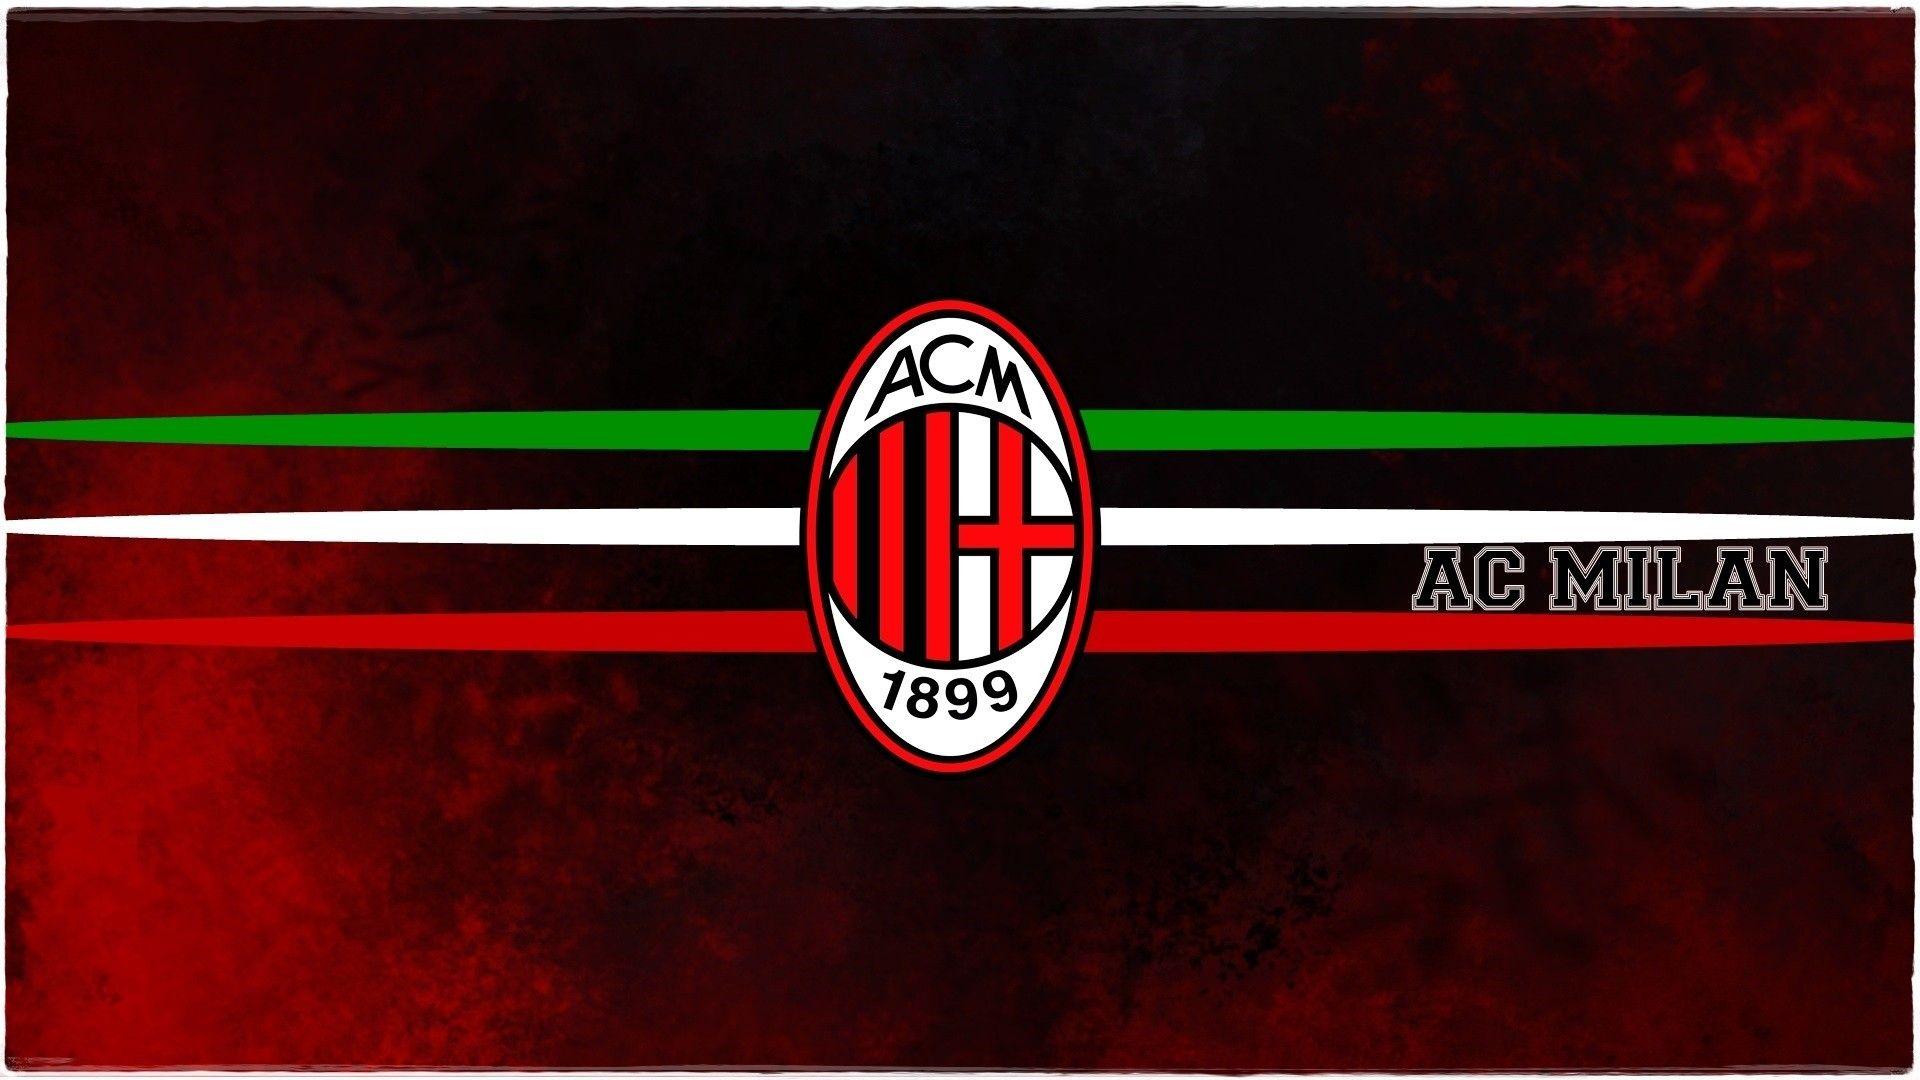 Ac Milan Wallpaper Forzamilan Acmilan Acm Acmilan1899 Weareacmilan Rossoneri Wallpaper Wallpapers Fond Ecran